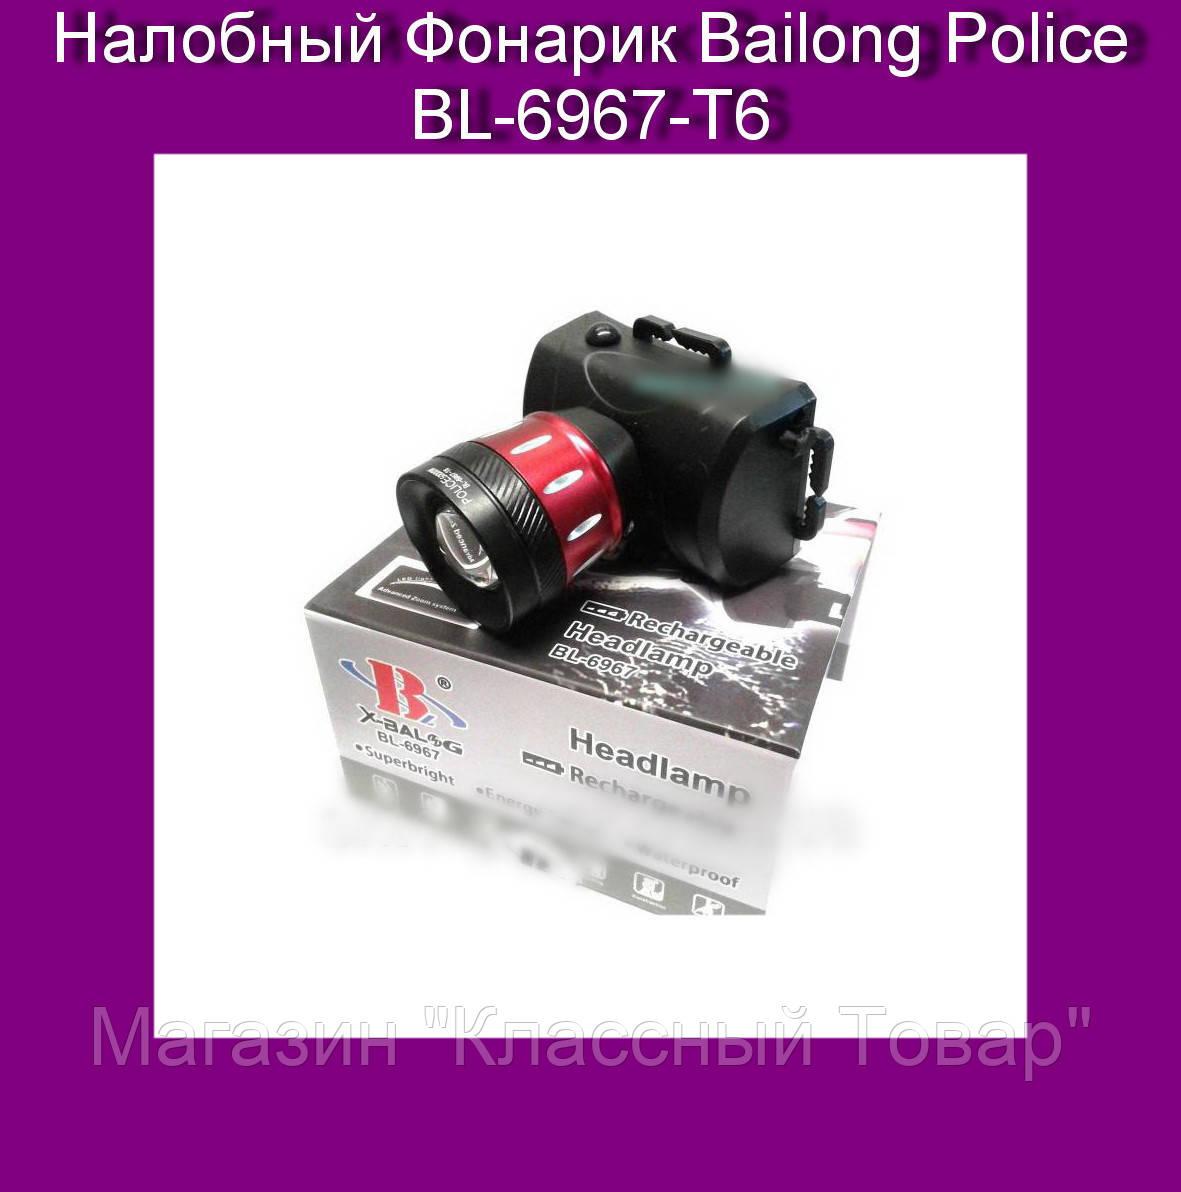 SALE! Налобный Фонарик Bailong Police BL-6967-T6